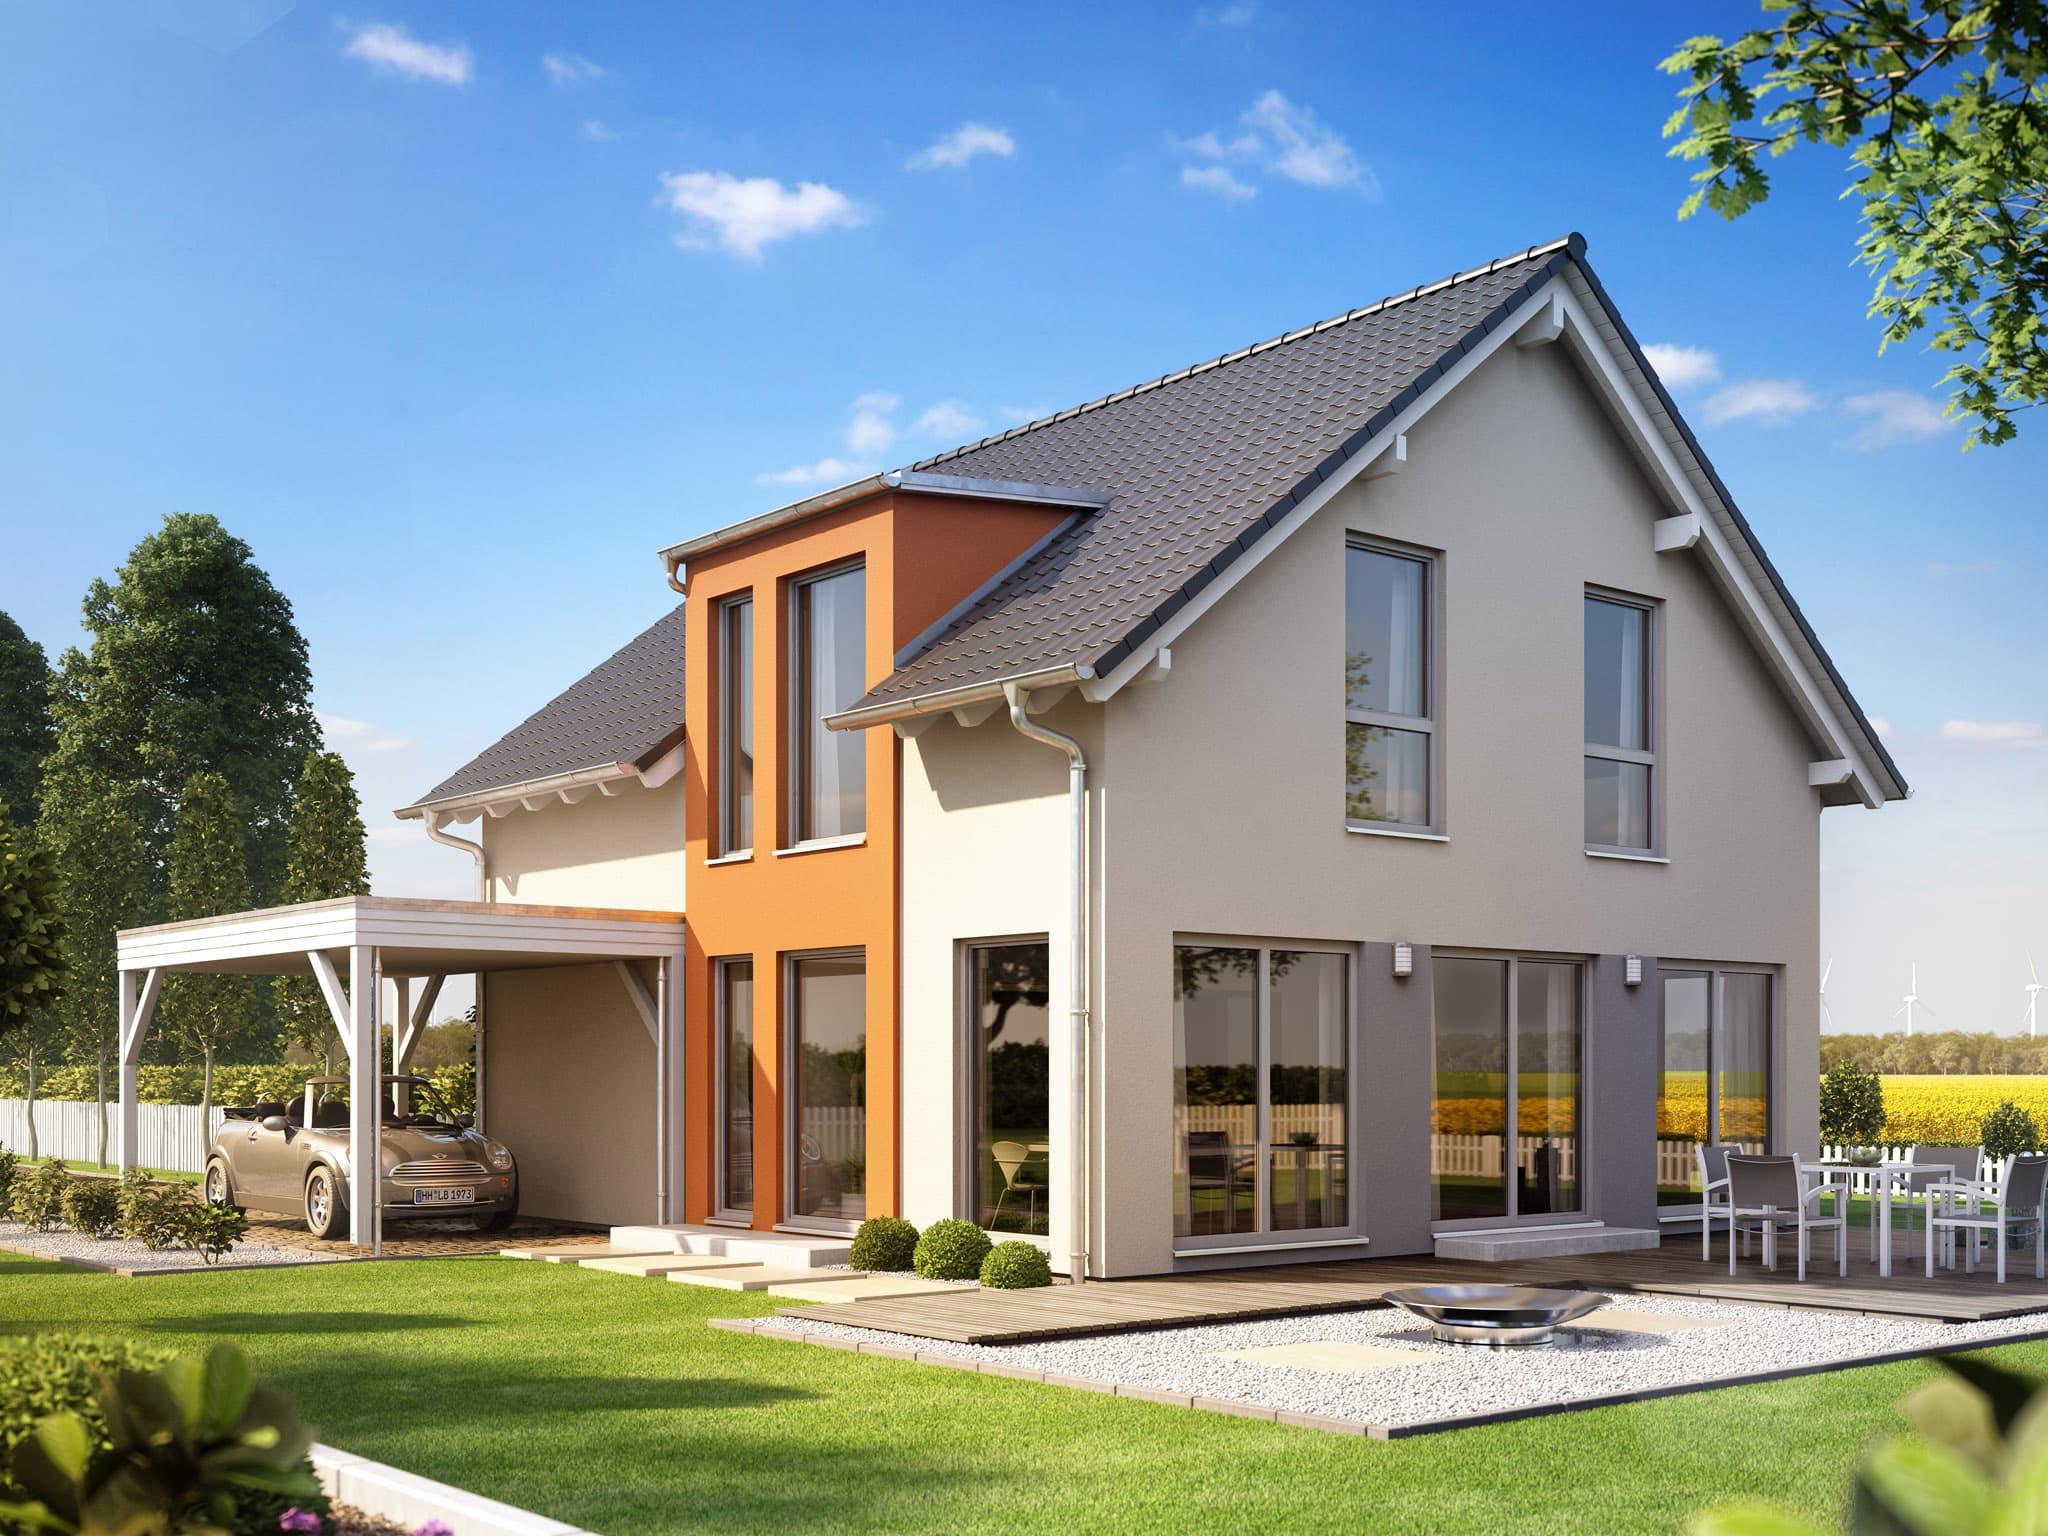 Einfamilienhaus mit Satteldach & Carport, 5 Zimmer, 135 qm - Haus bauen Ideen Fertighaus Living Haus SUNSHINE 136 V2 a - HausbauDirekt.de